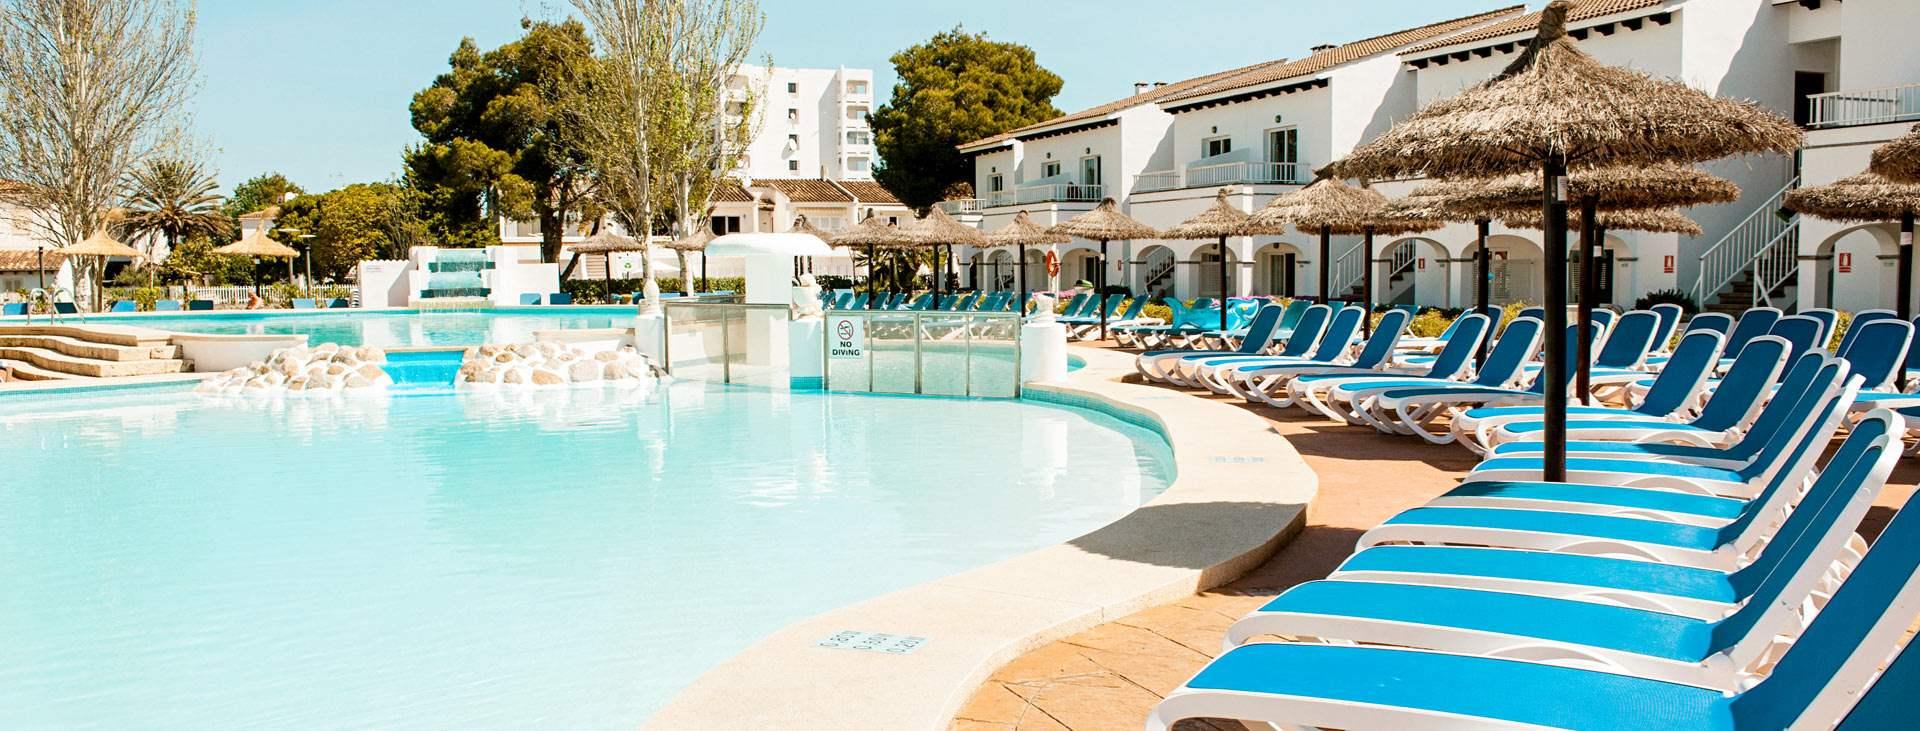 Sea Club Bestil Hotel I Alcudia Hos Spies